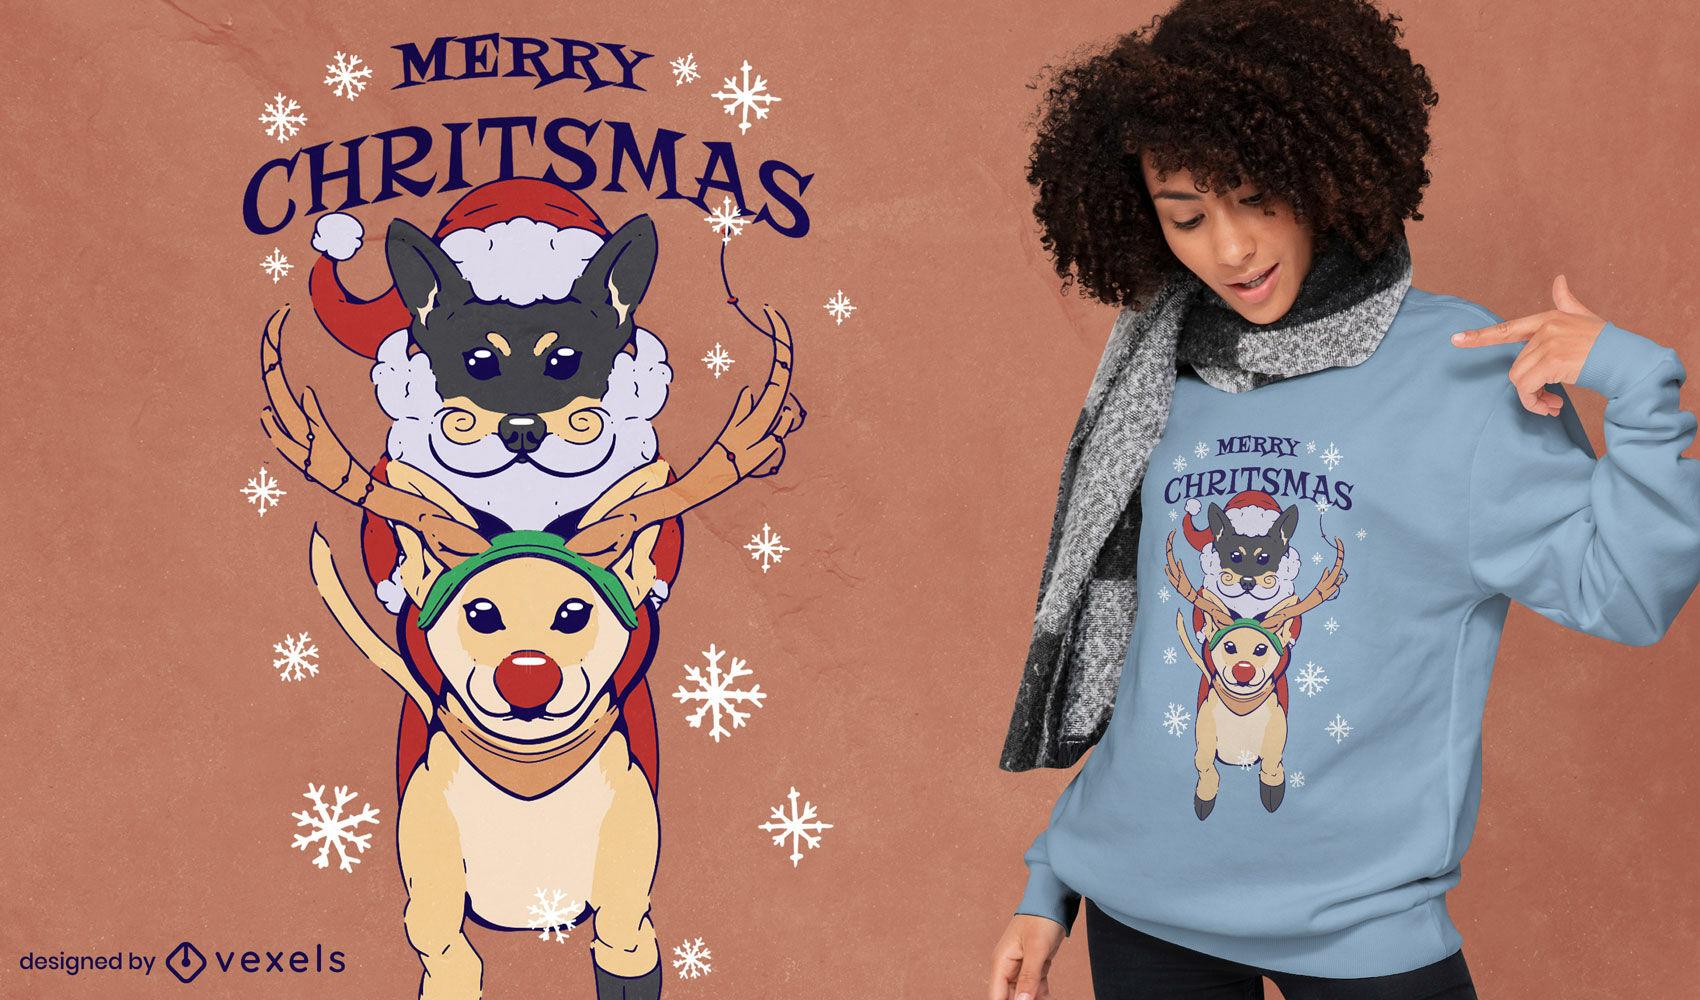 Cute Christmas dogs t-shirt design